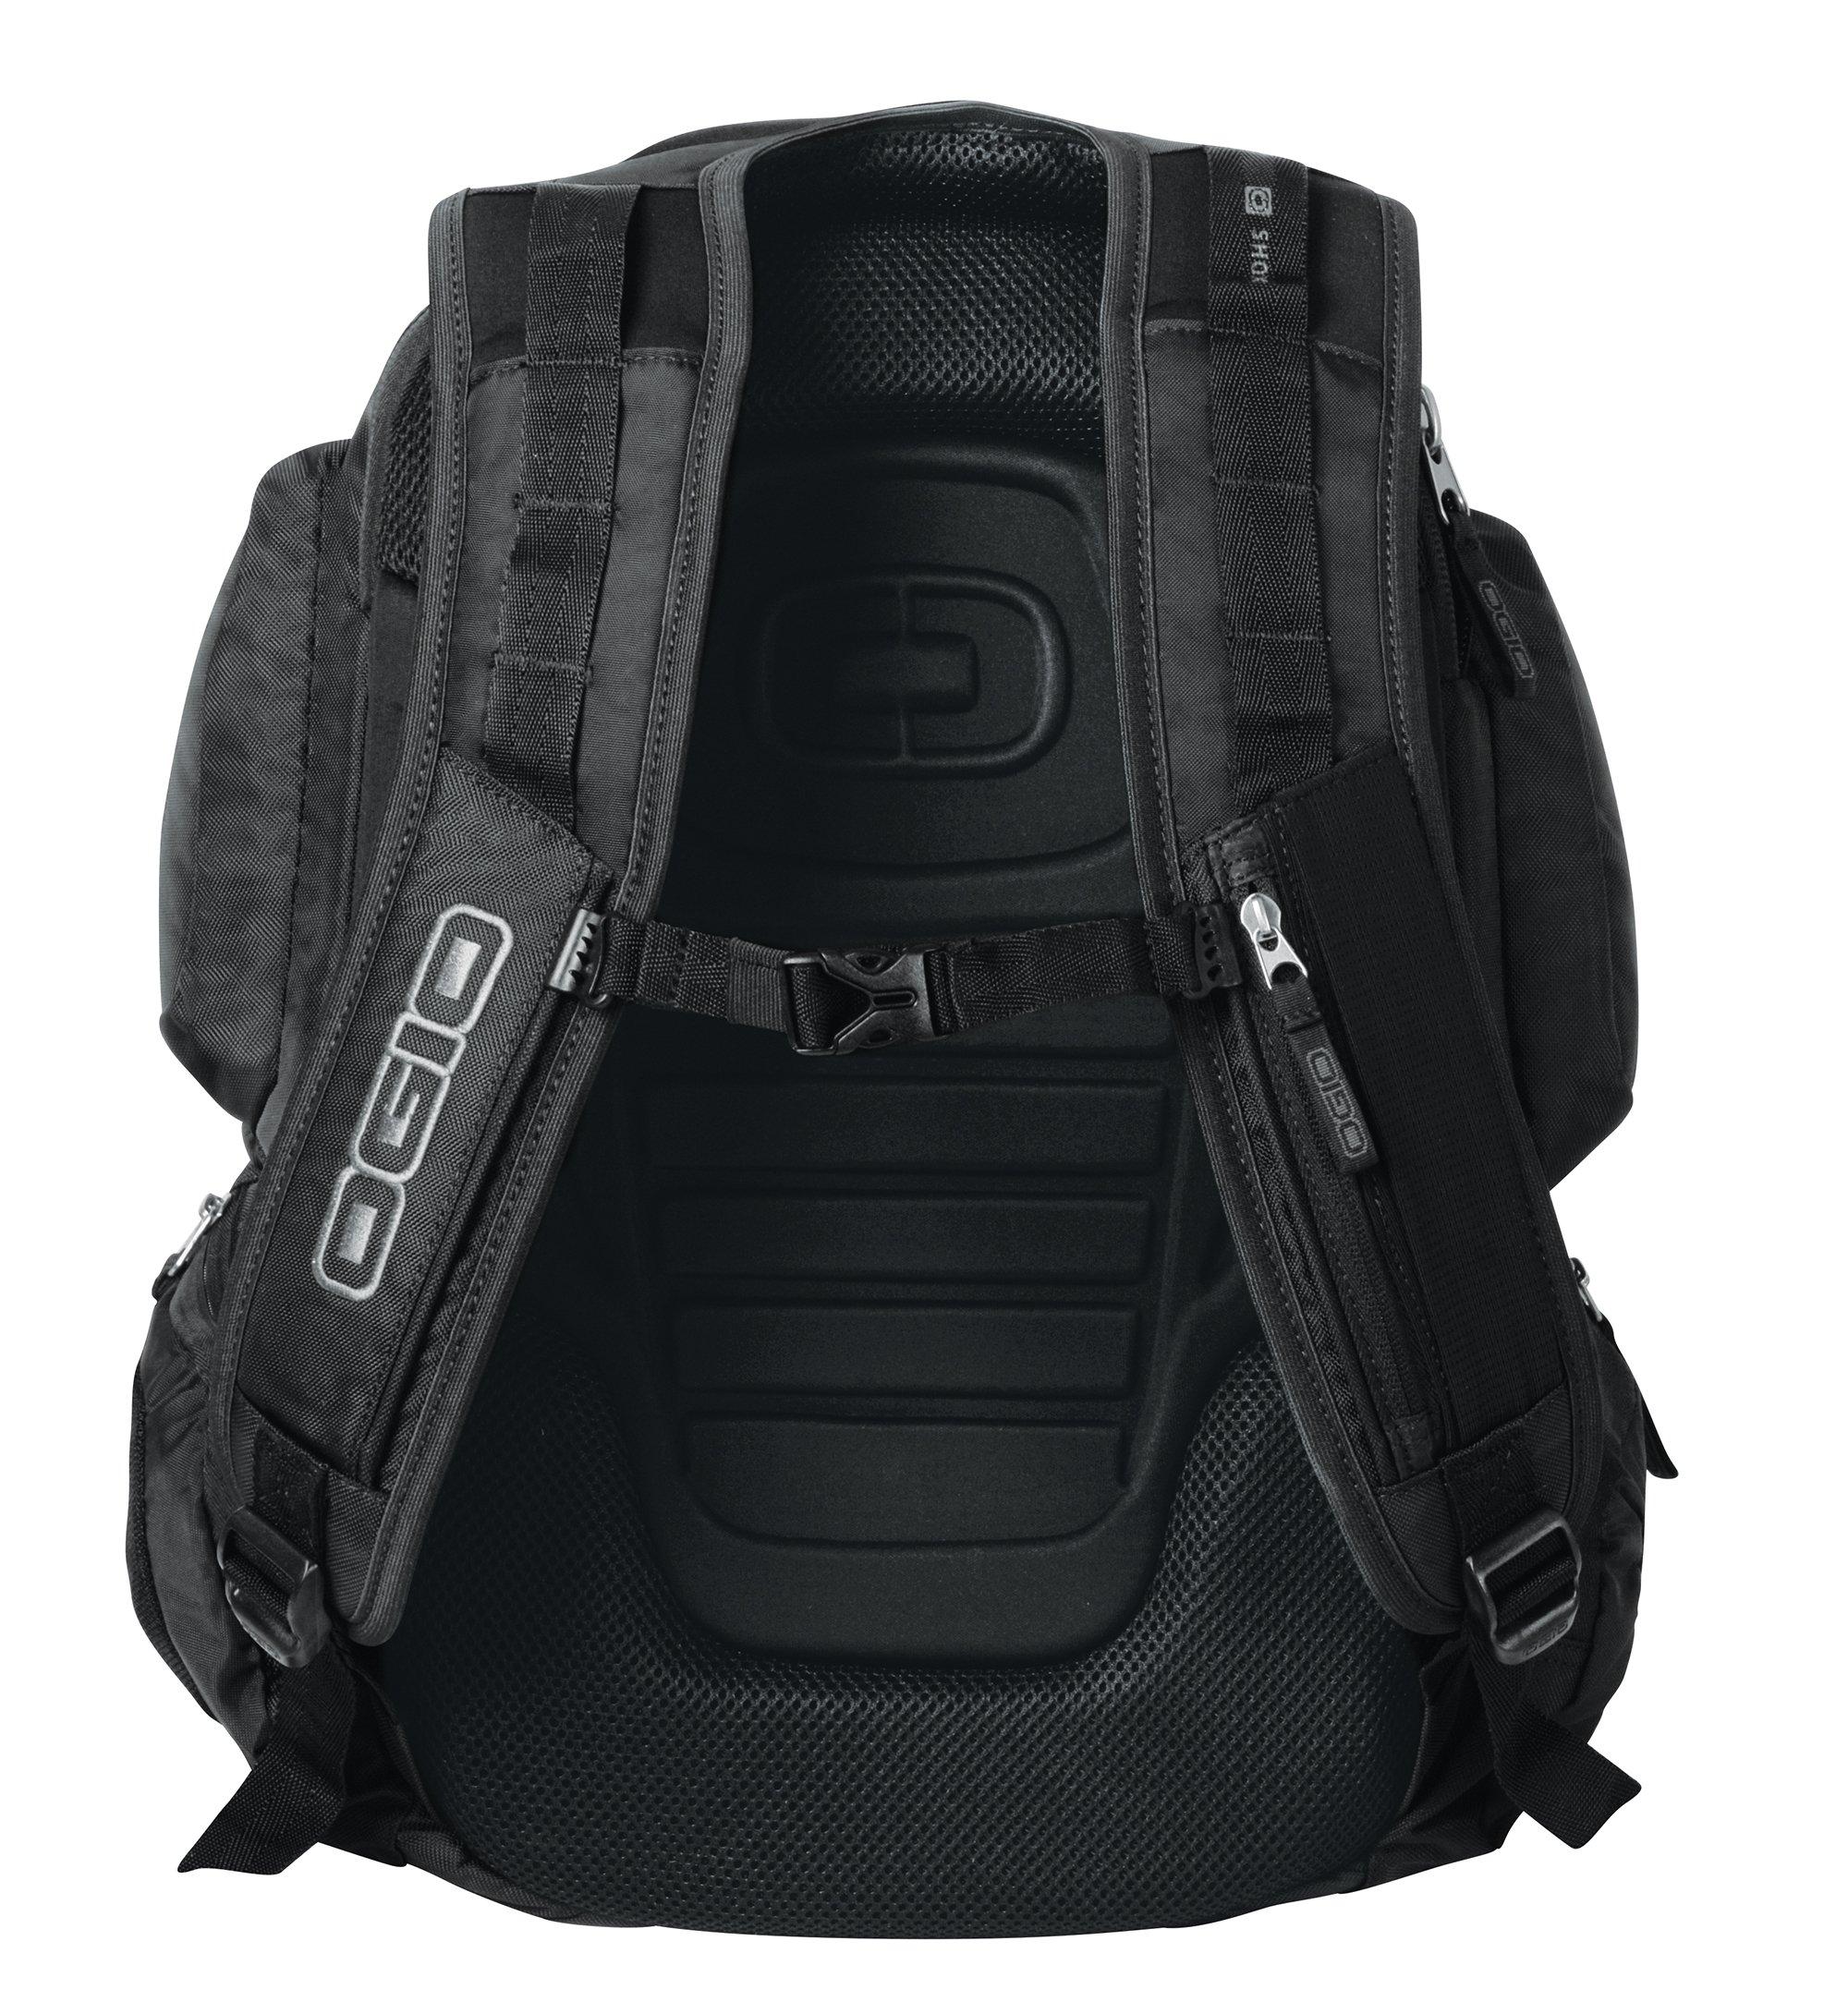 OGIO Squadron Pack Black 17'' Laptop / Macbook Pro Black Backpack by OGIO (Image #4)